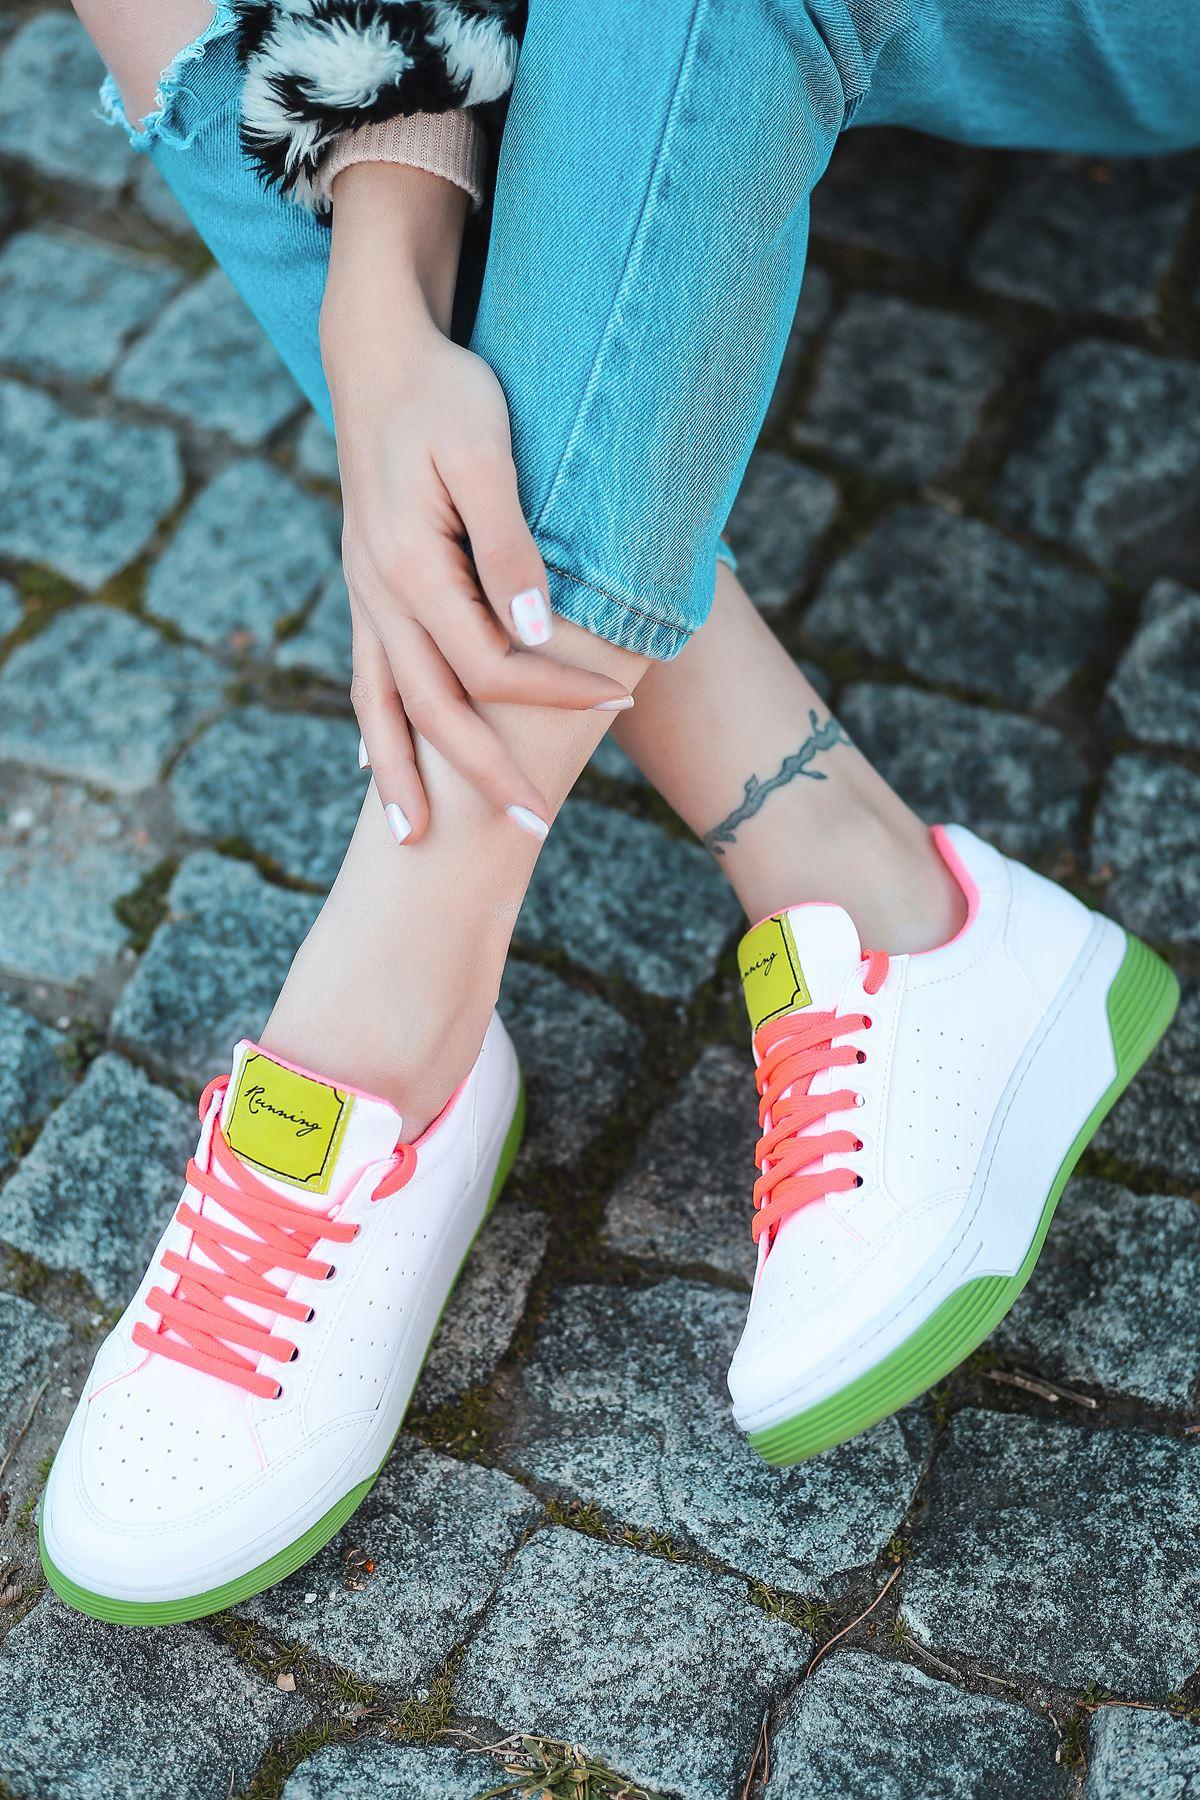 Fuzzy Mat Deri Yeşil Taban Bağcık Detay Sneakers